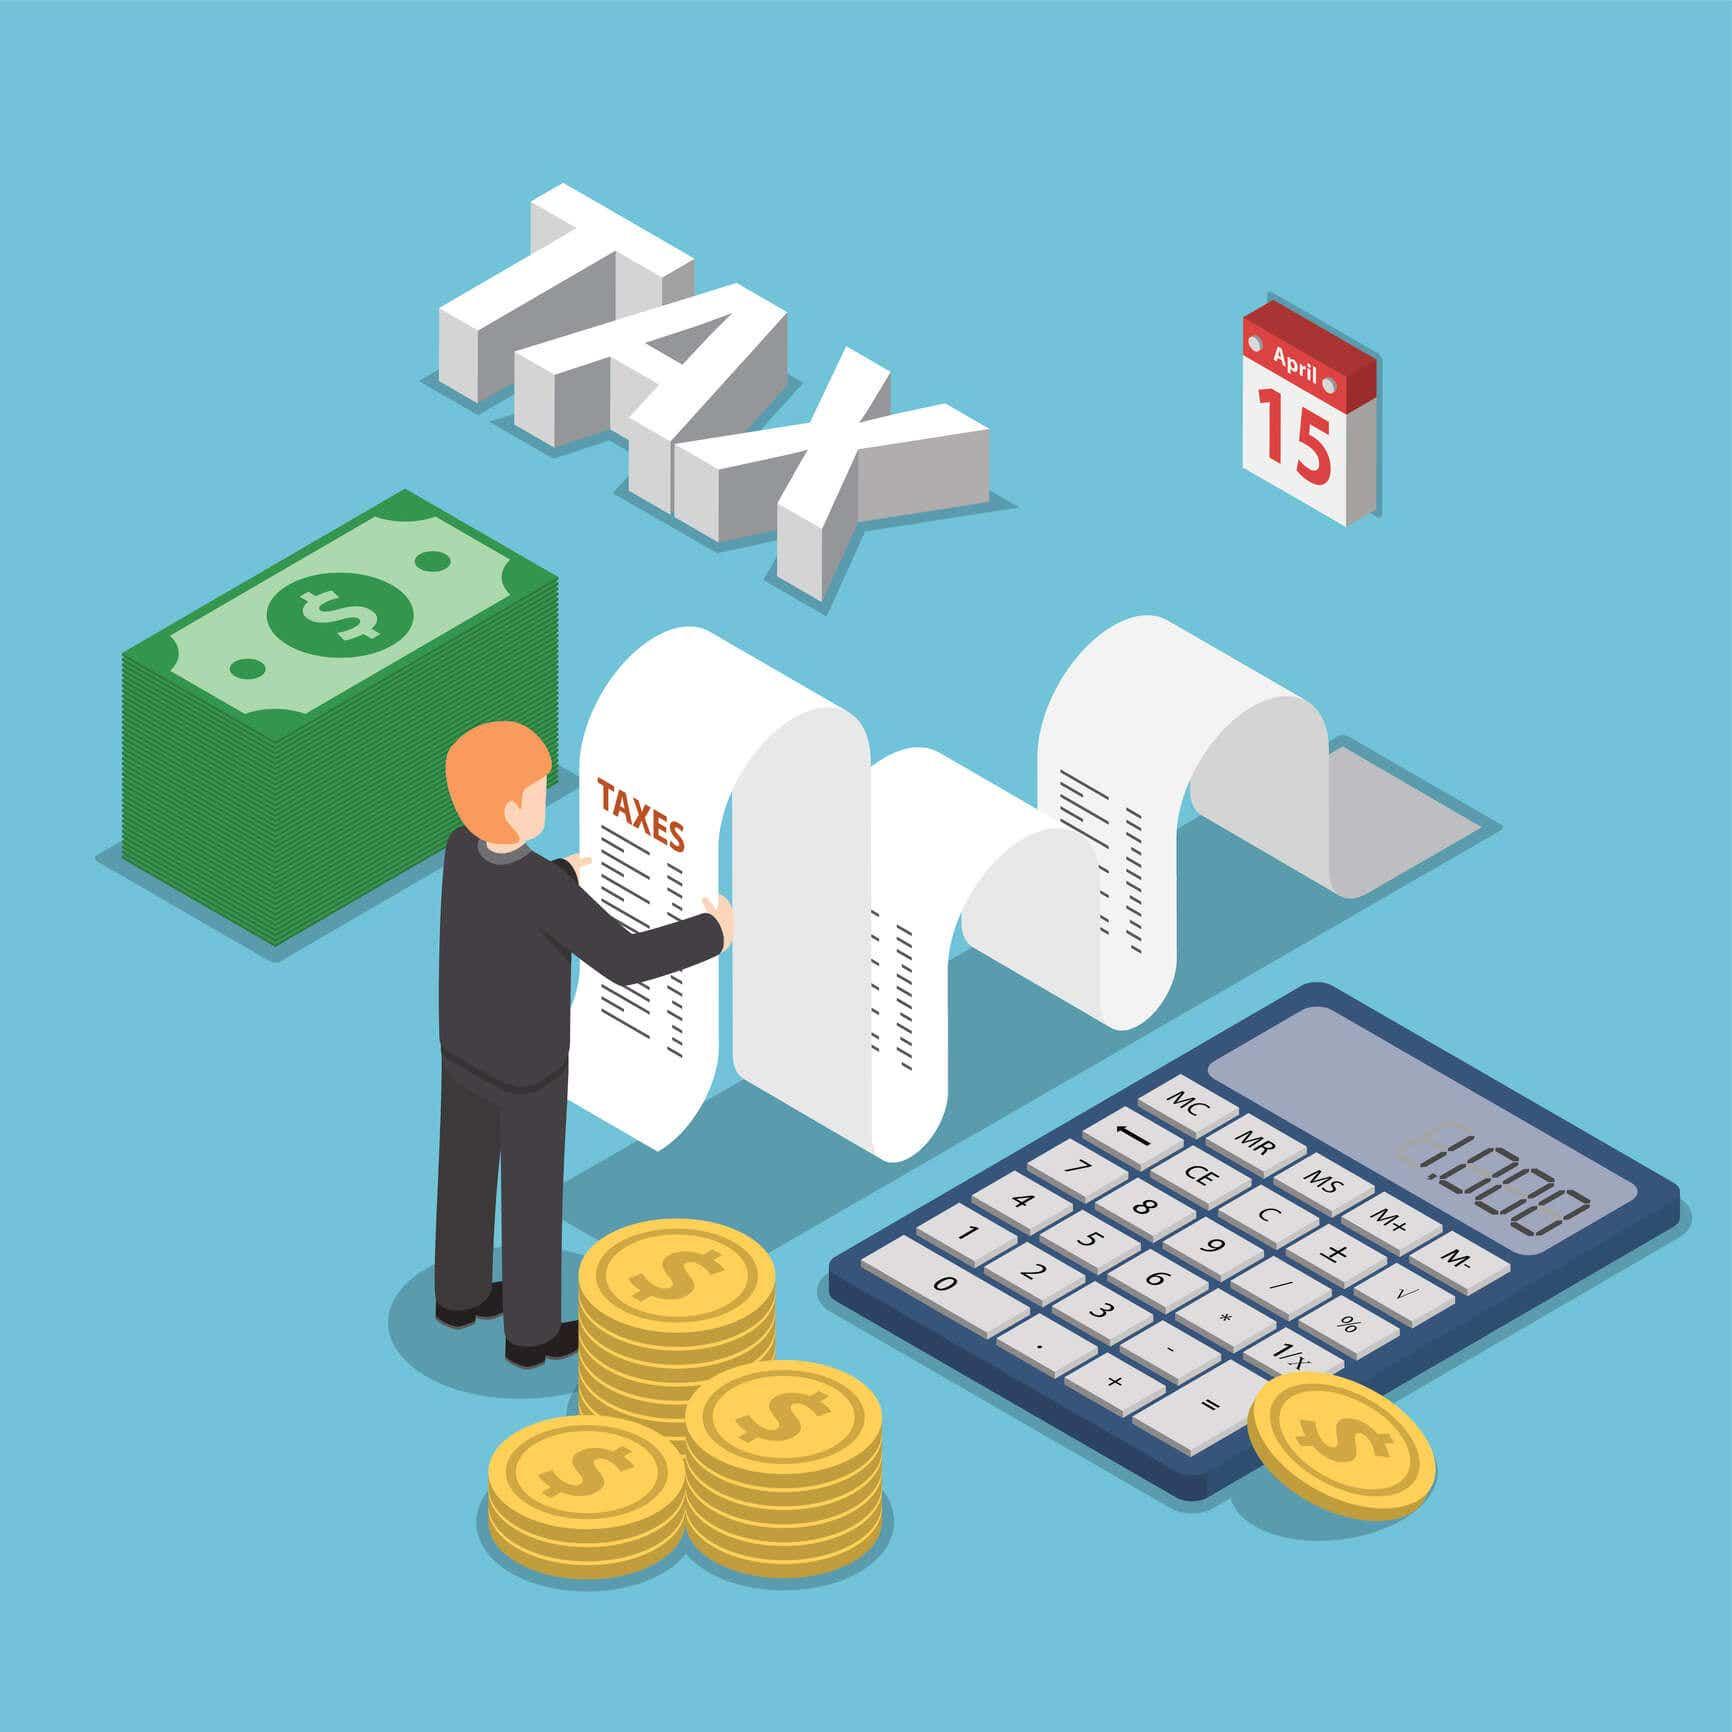 sole proprietor advantage simpler and cheaper tax returns